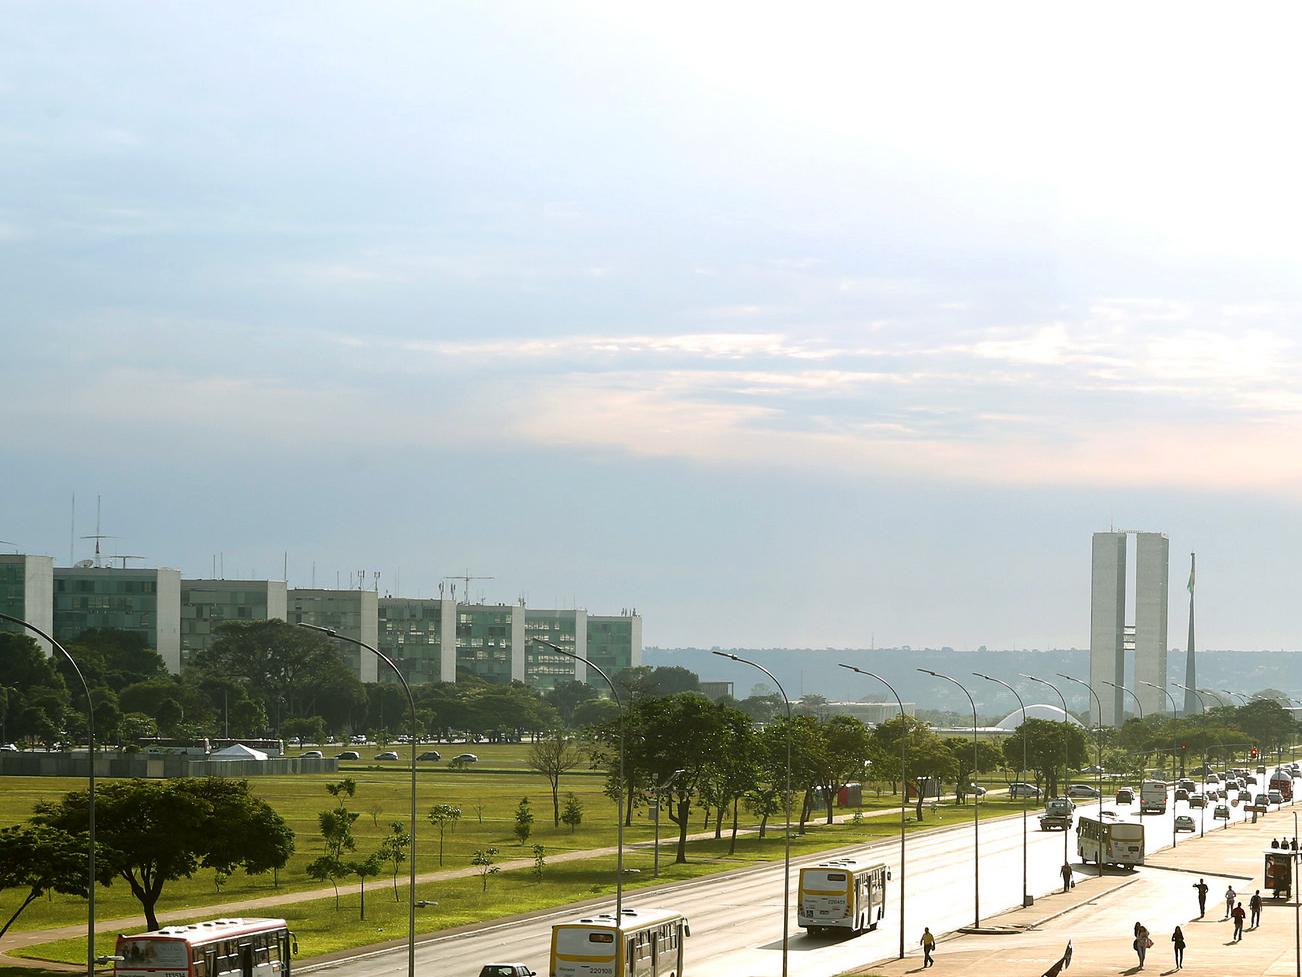 Foto: Dênio Simões / Agência Brasília